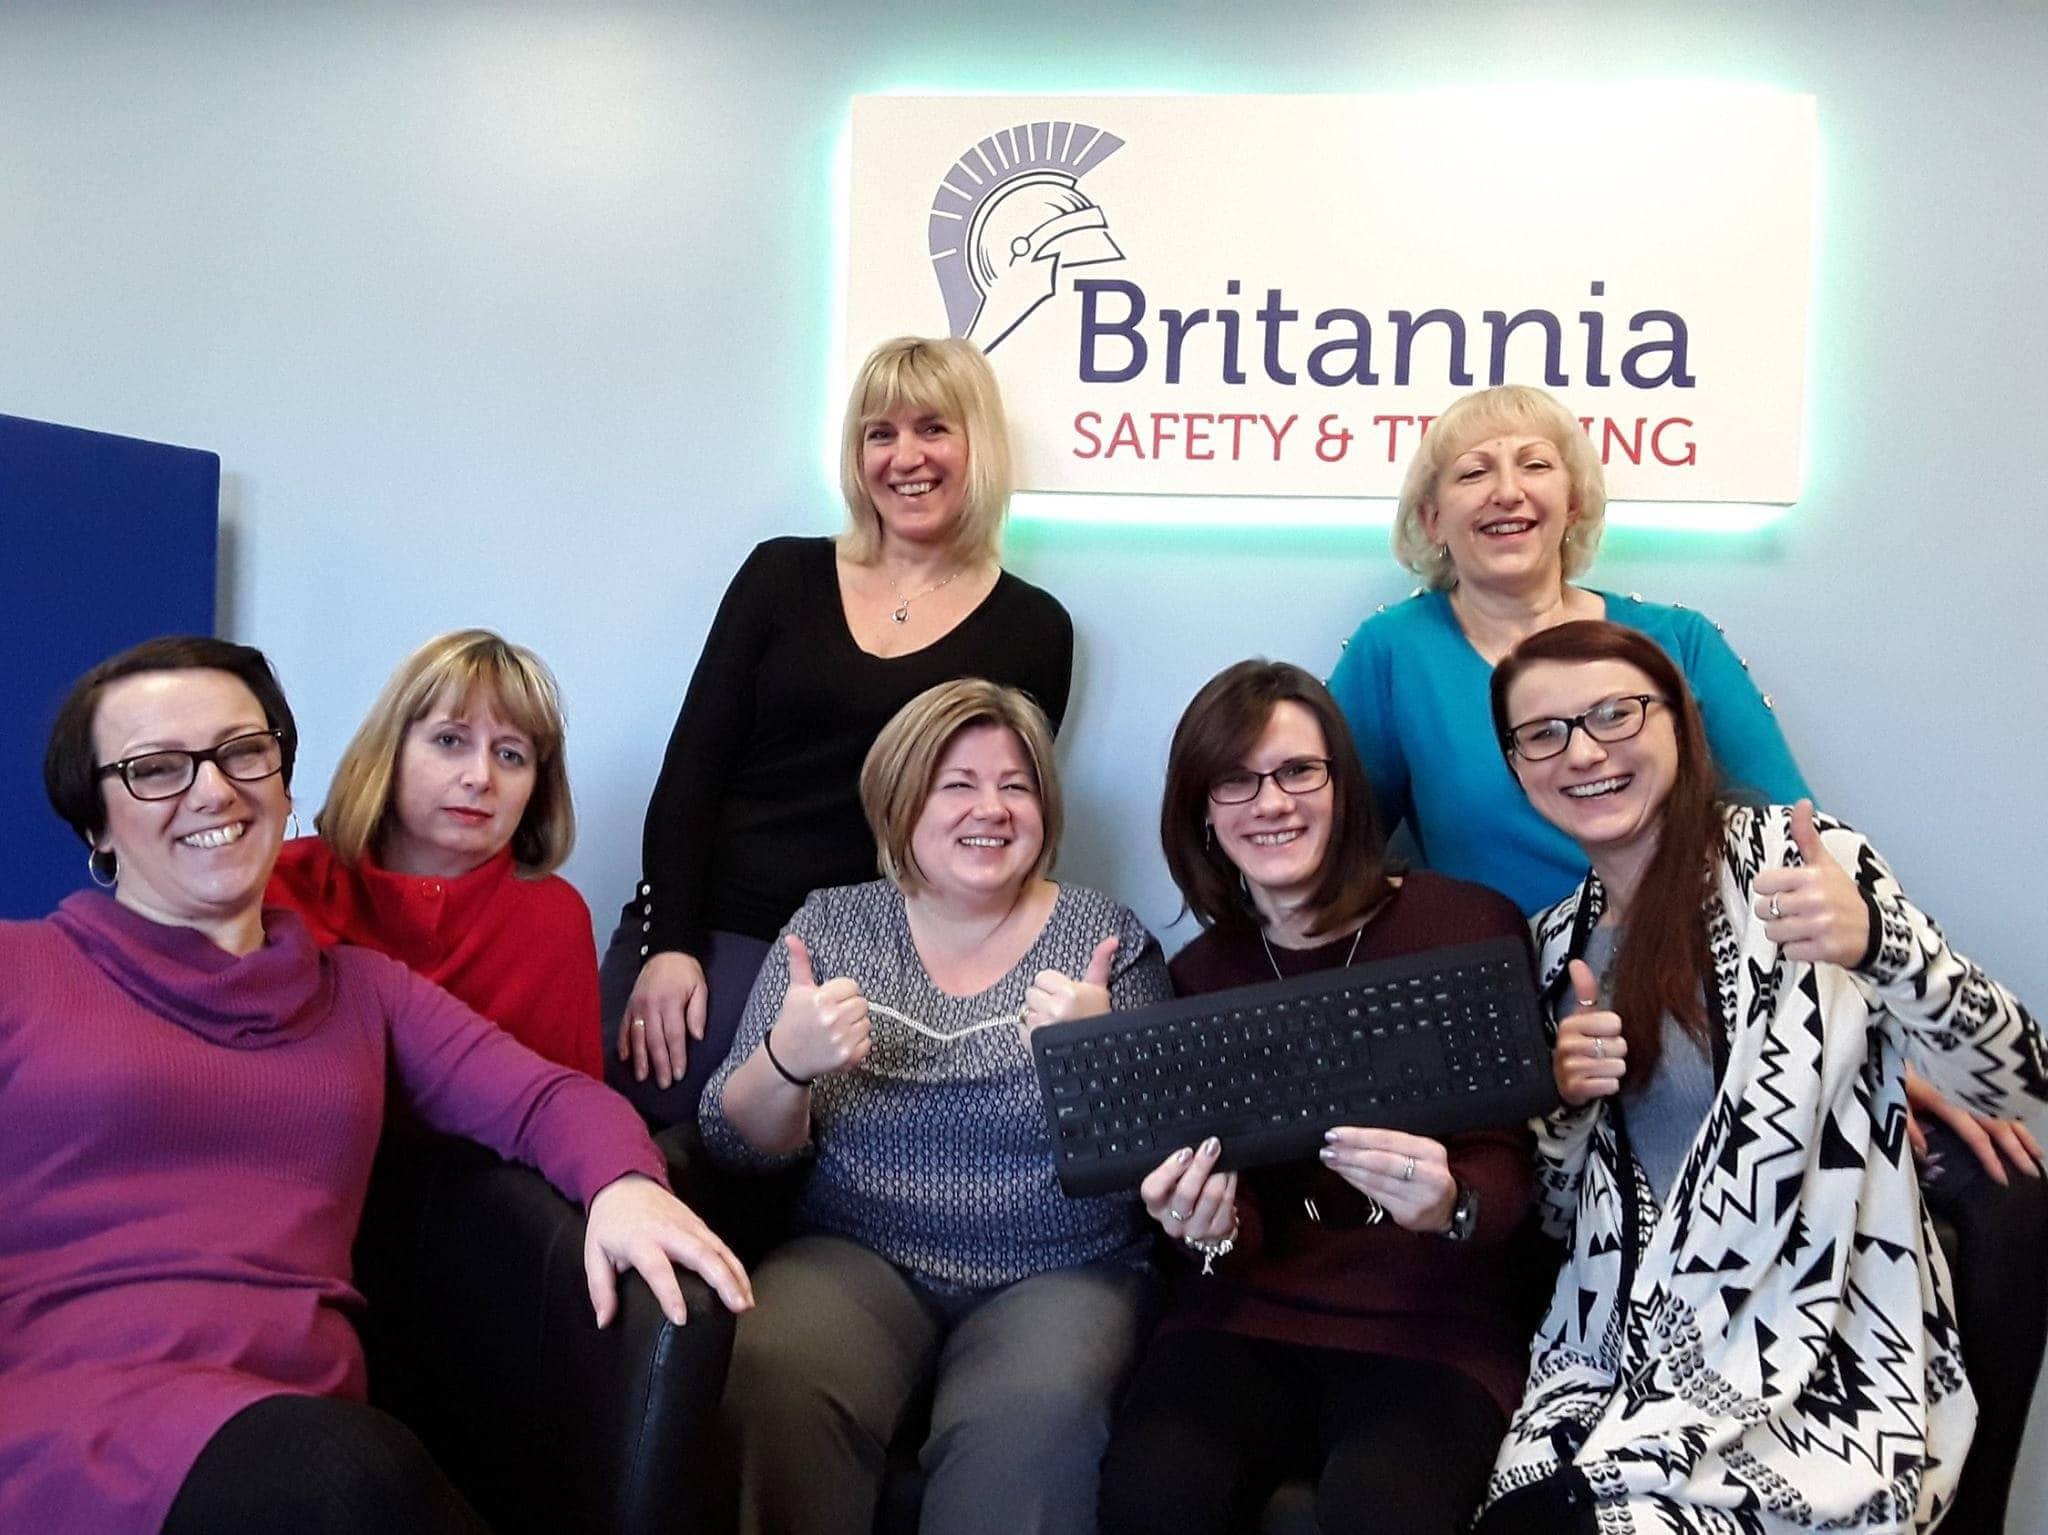 Britannia's official website launch